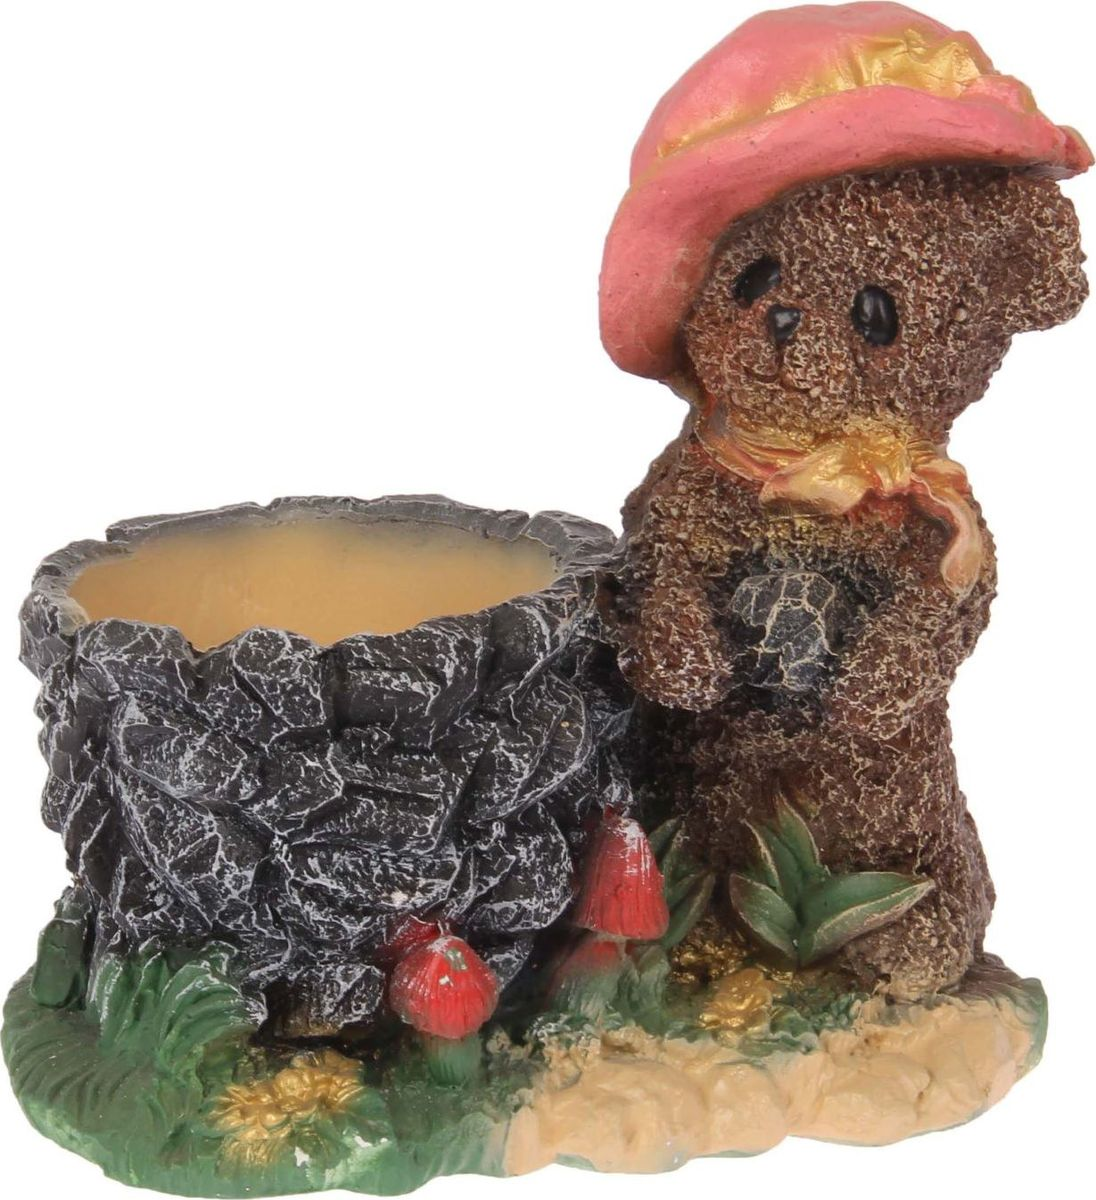 Кашпо Premium Gips Медведь в шляпе, 17 х 23 х 22 см1623343